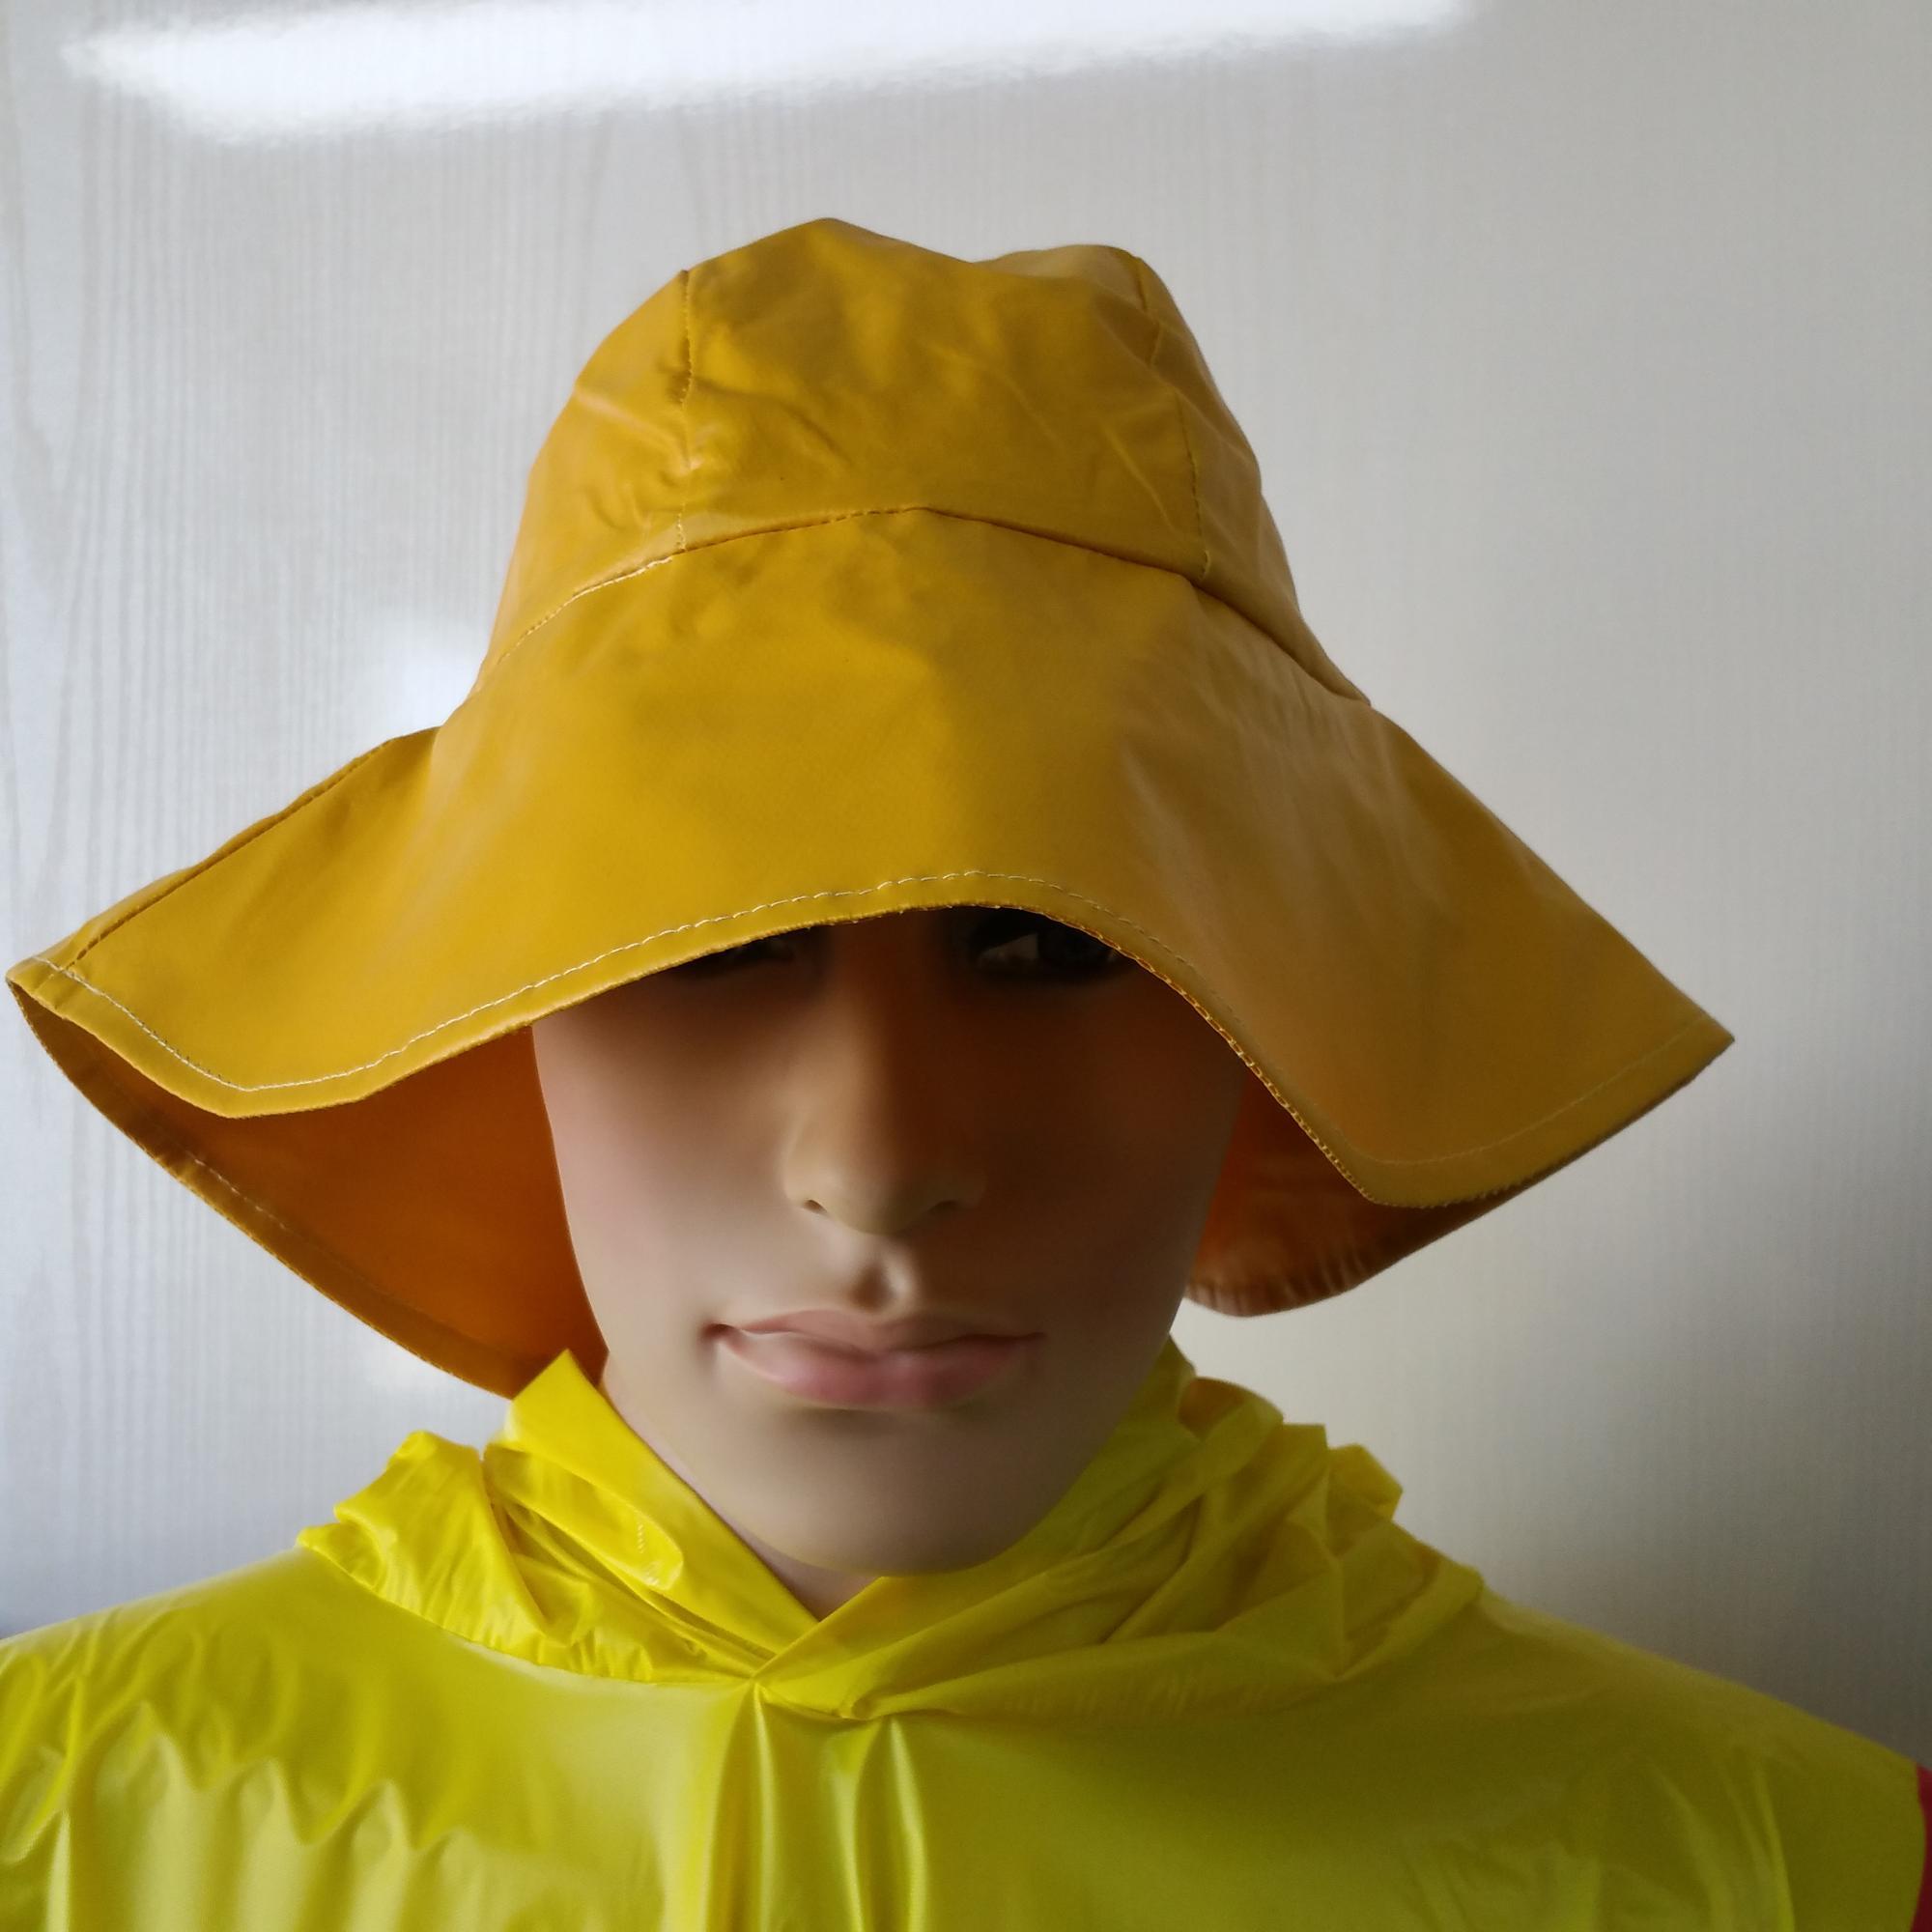 New Fashional Fisherman Waterproof Pvc polyester Rain Hat - Buy ... a1c195d84d4